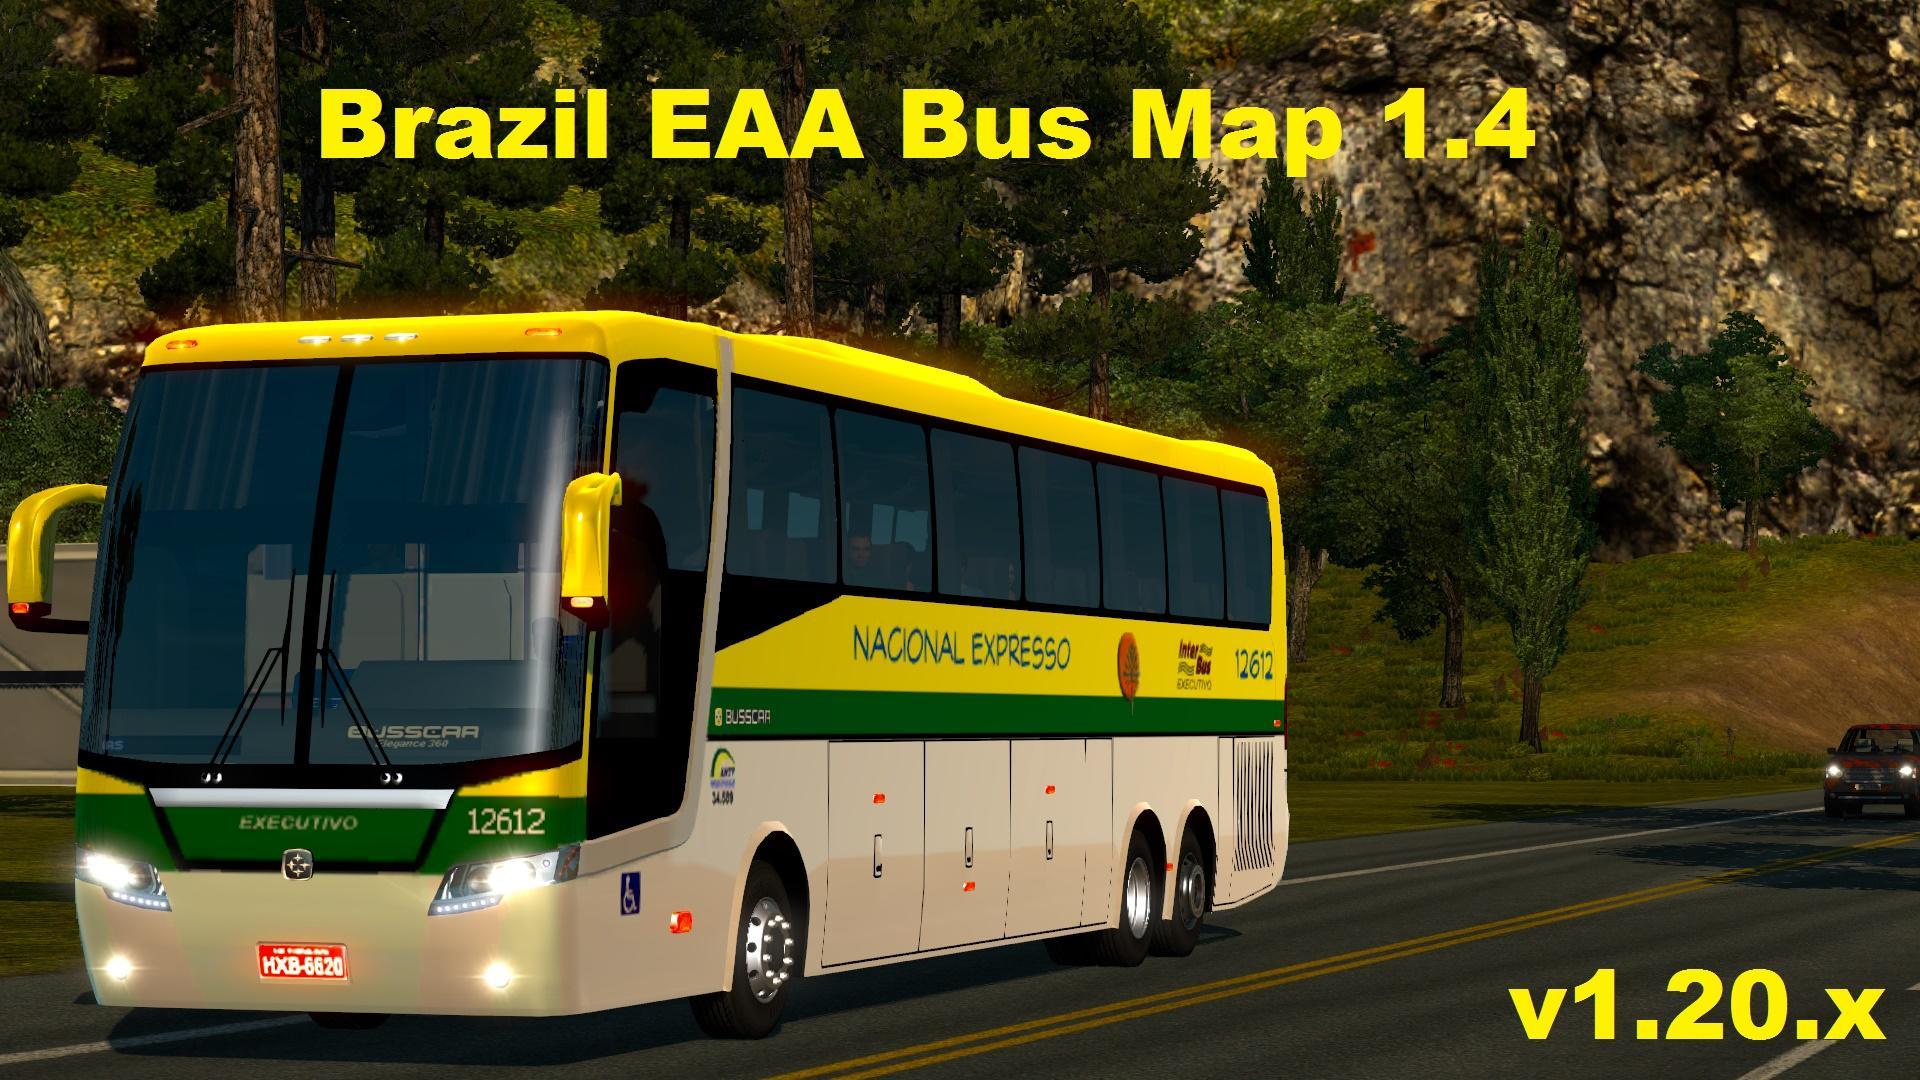 brazil-eaa-bus-map-1-4-1-20_1